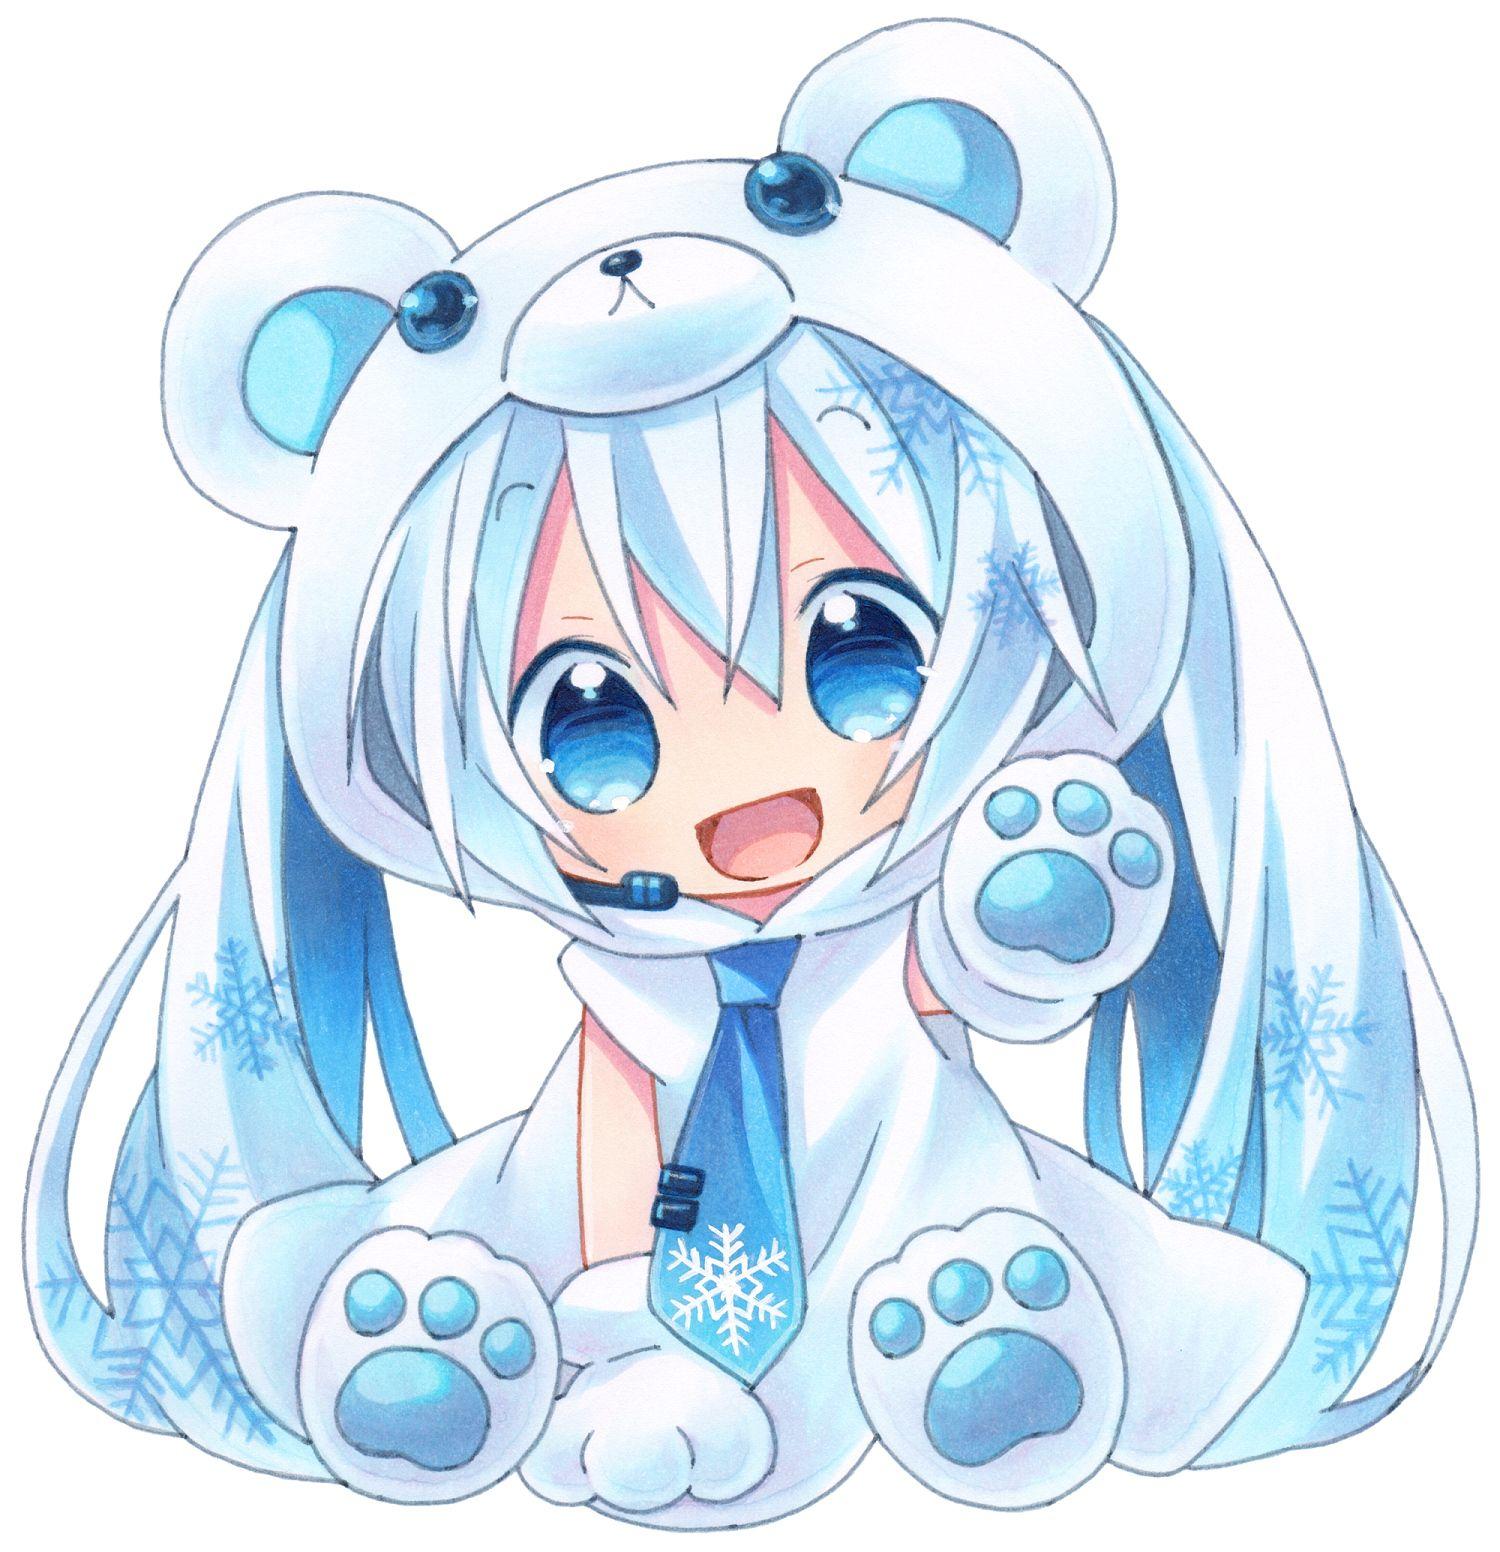 Images For > Cute Chibis Anime Manga anime, Dễ thương